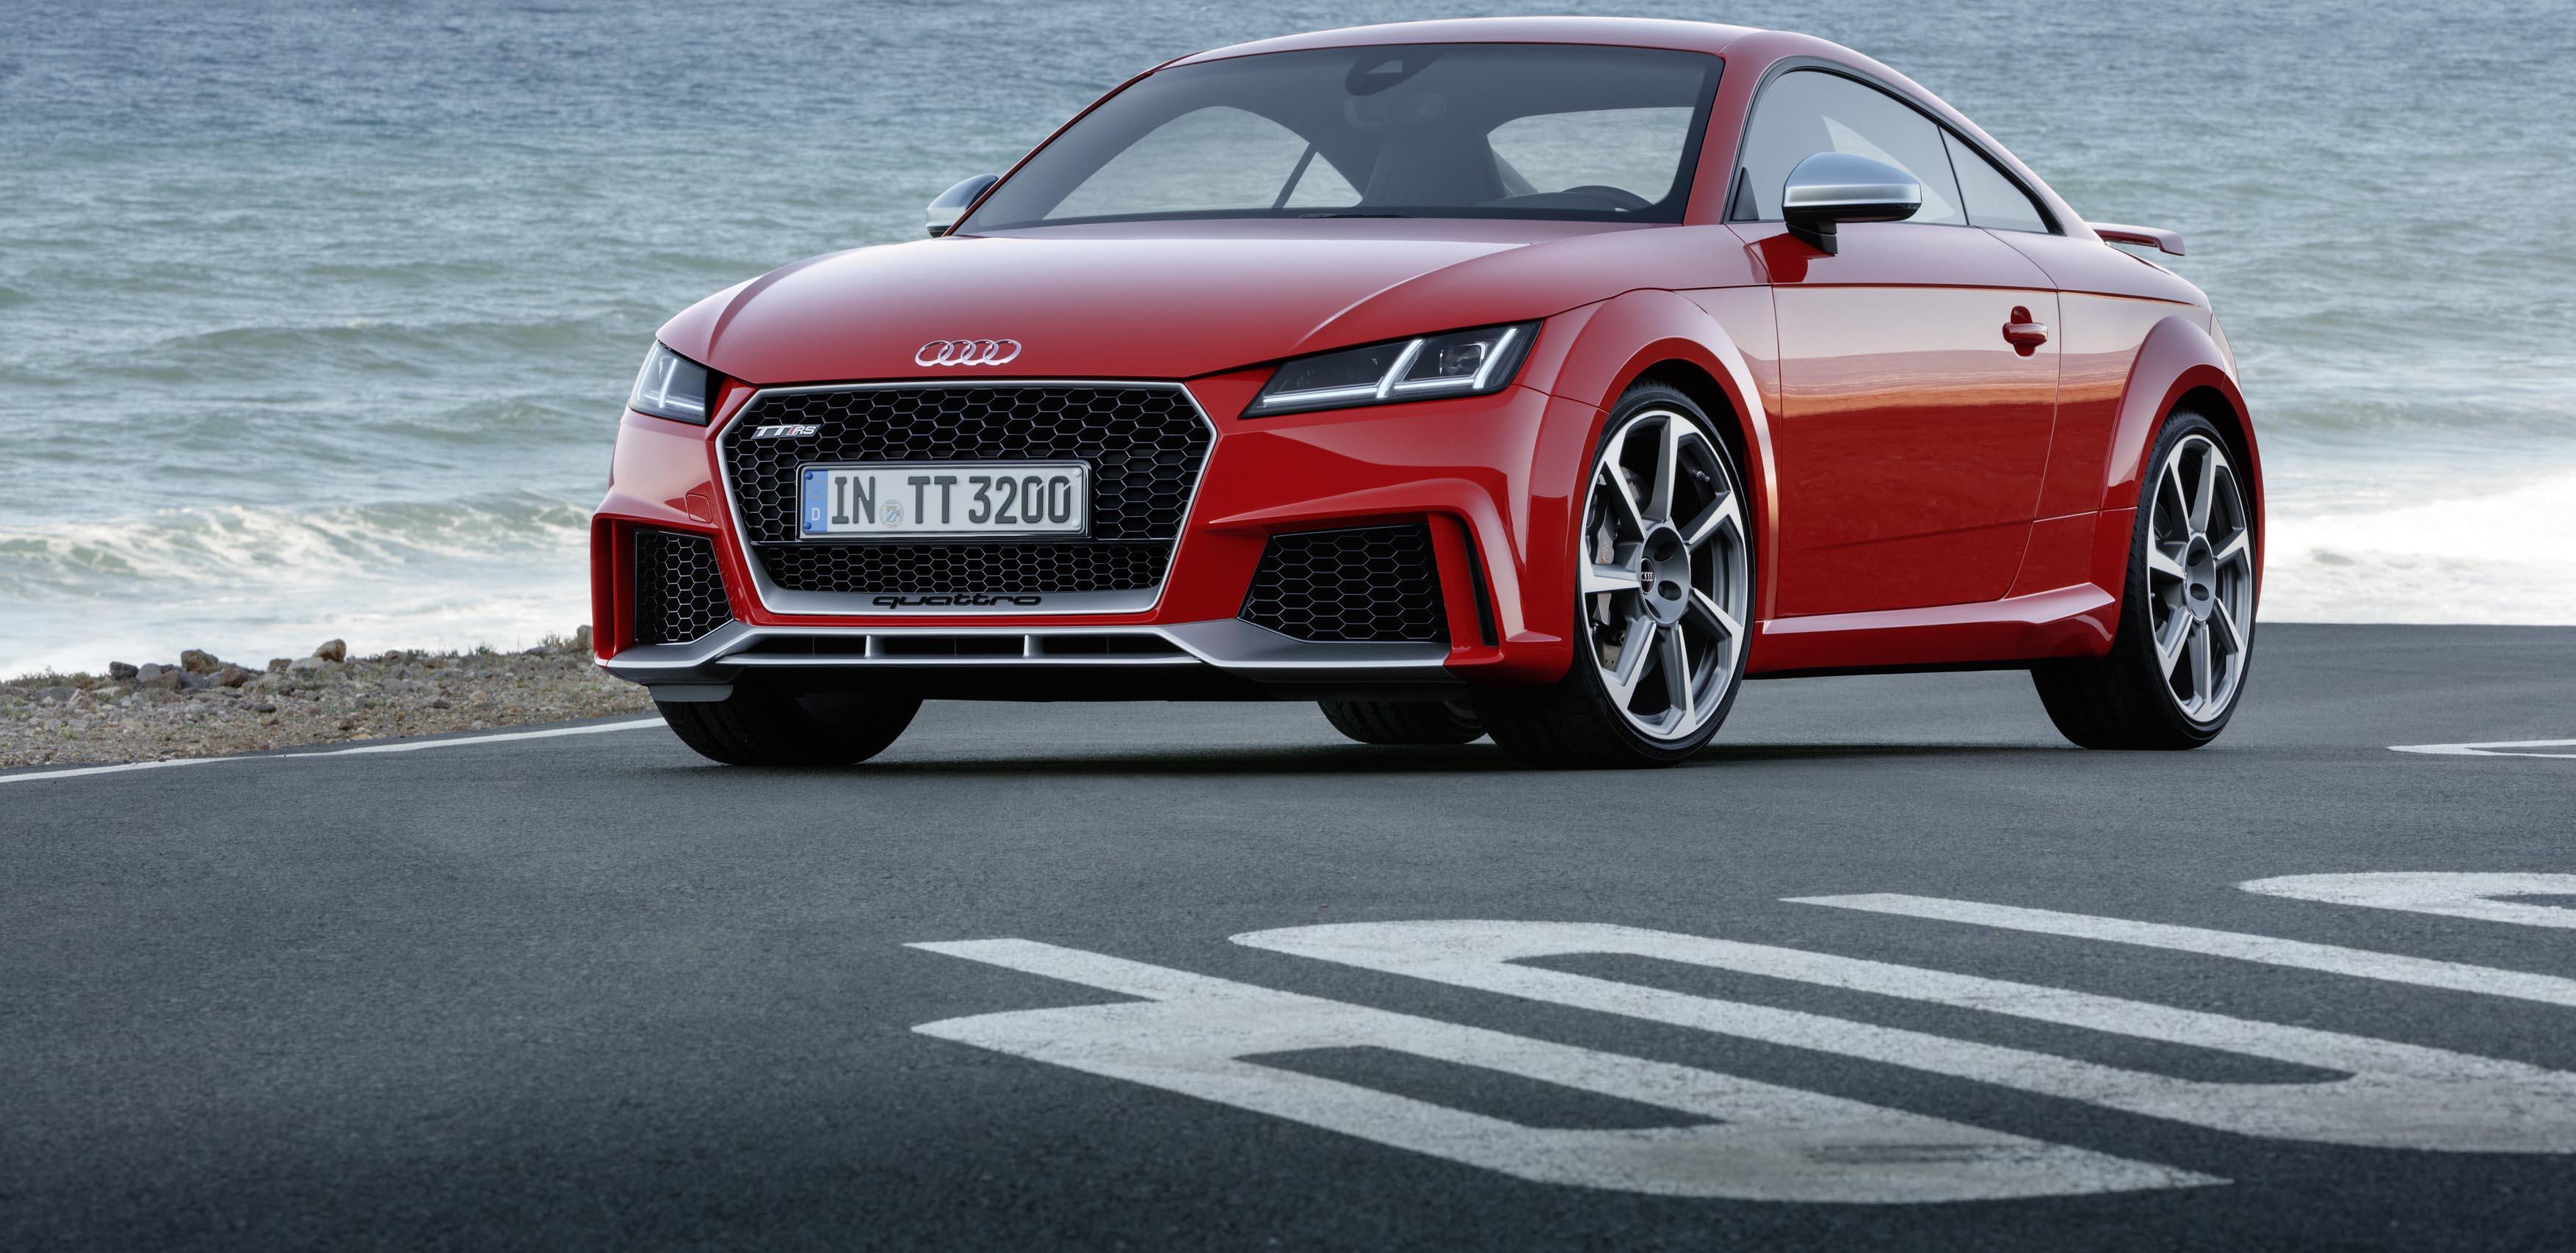 Más fuerte que nunca: Nuevo Audi TT RS Coupé y Audi TT RS Roadster